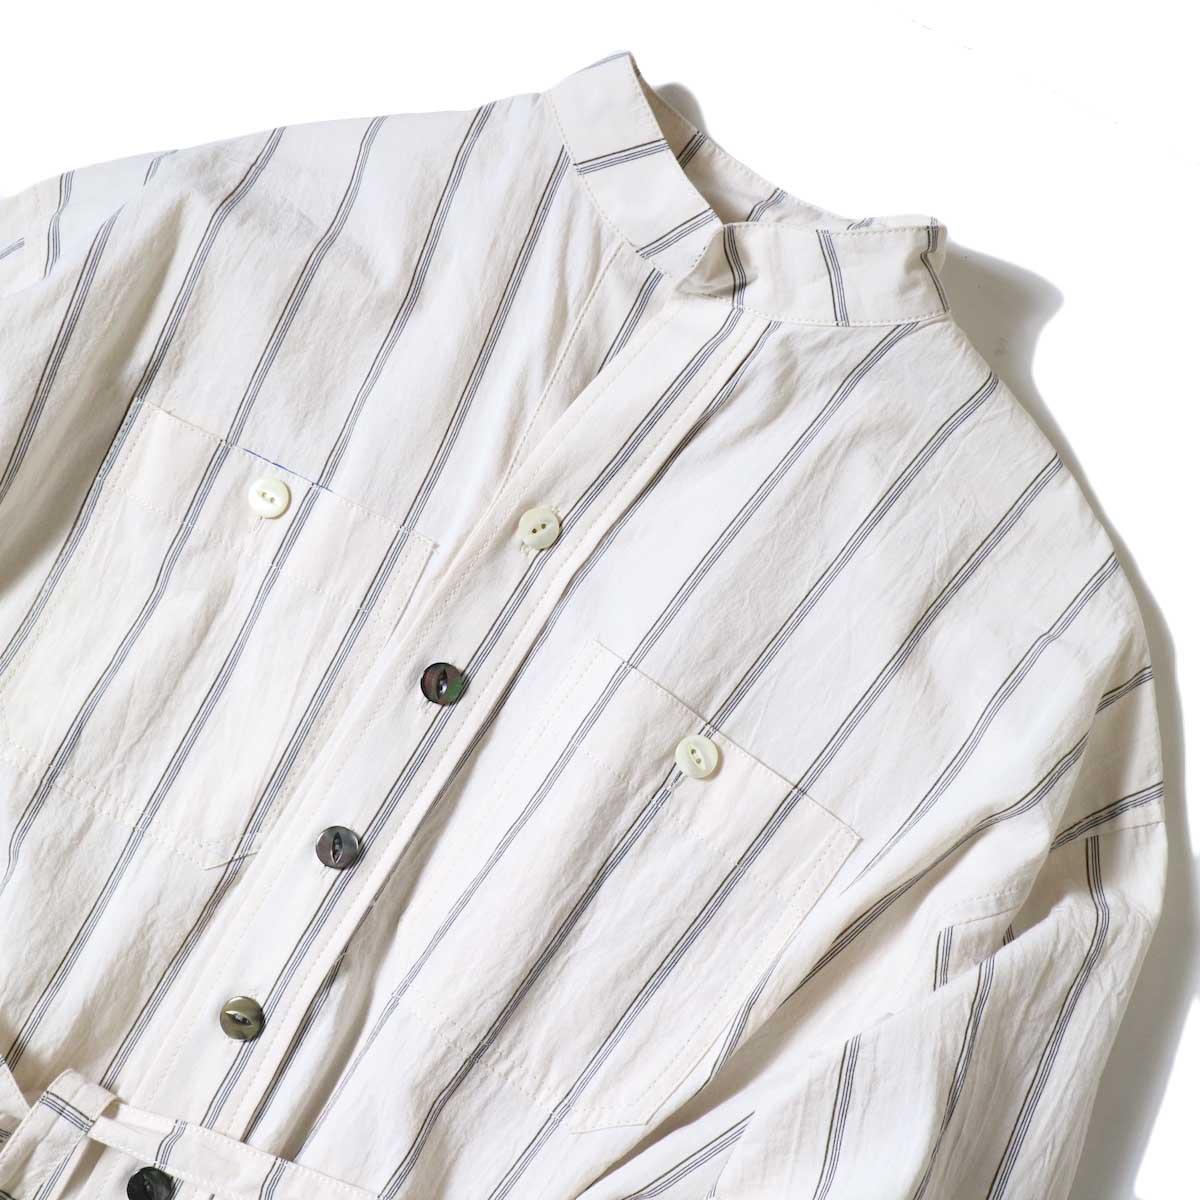 BLUEBIRD BOULEVARD / ブストライプダブルワッシャーシャツドレス (Ivory×Navy・Black) フロントアップ